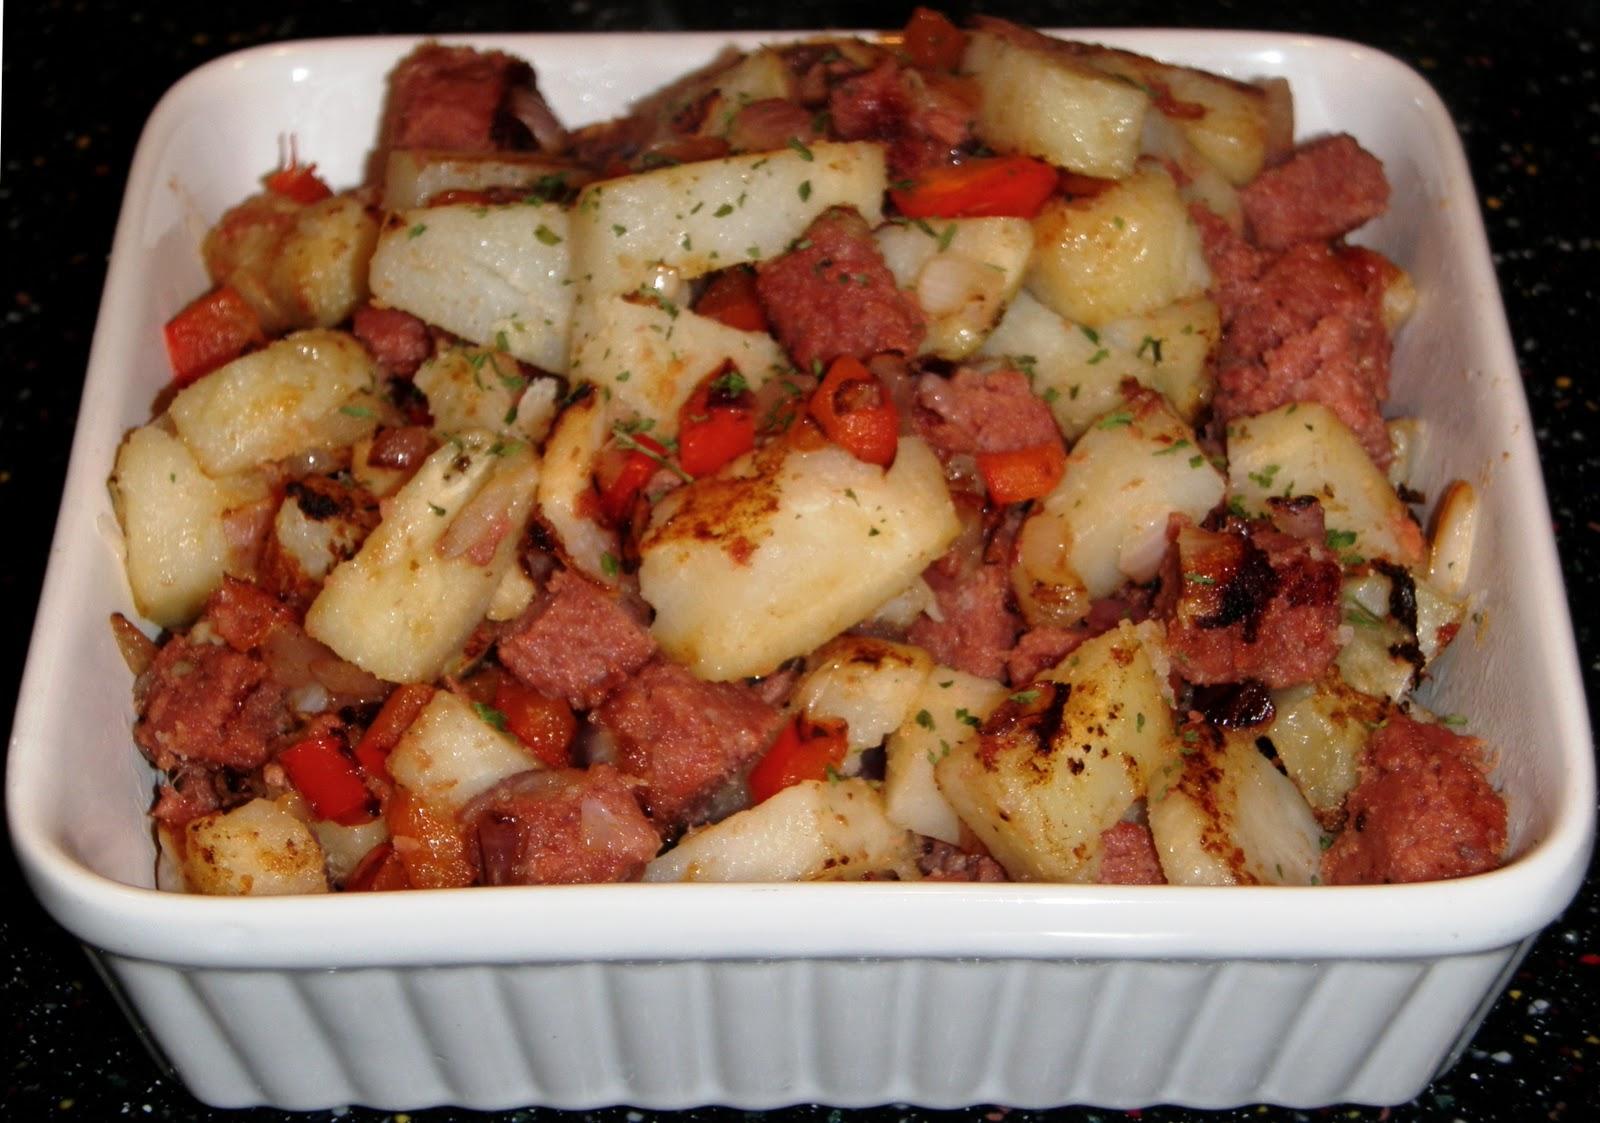 Sandra's Alaska Recipes: SANDRA'S RUSTIC CORNED BEEF HASH